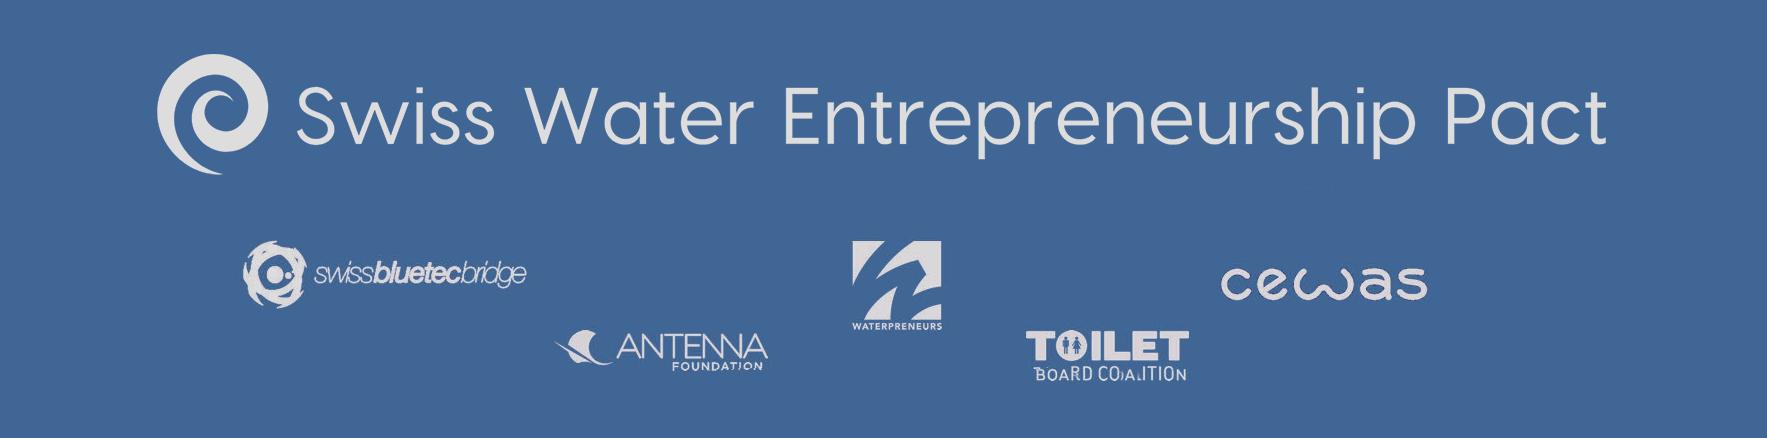 Swiss Water Entrepreneurship Pact